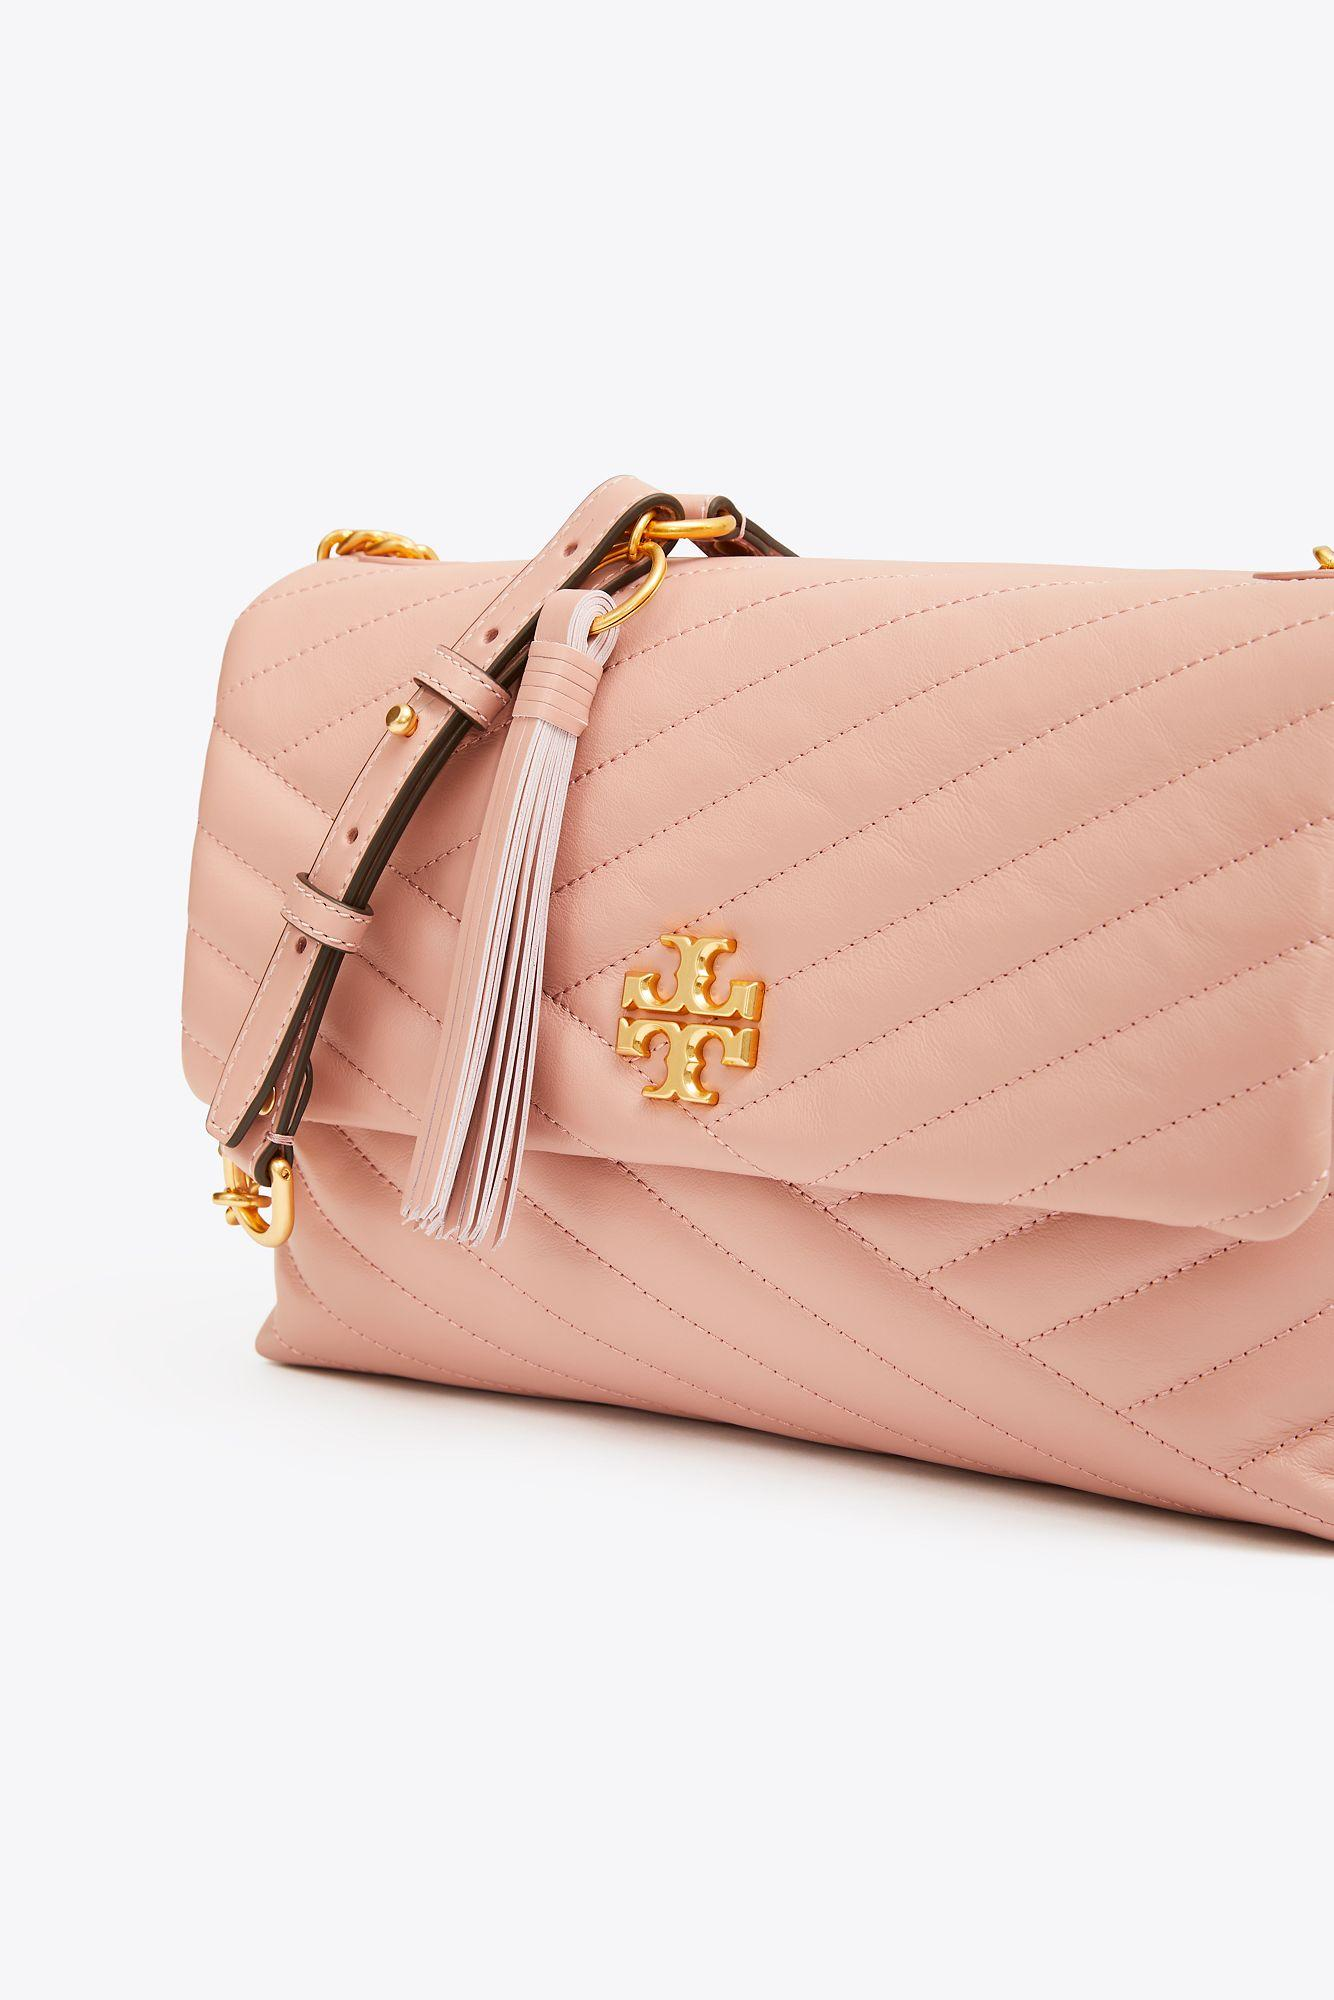 8ce609d6eb14 ... Kira Chevron Flap Shoulder Bag - Lyst. View fullscreen